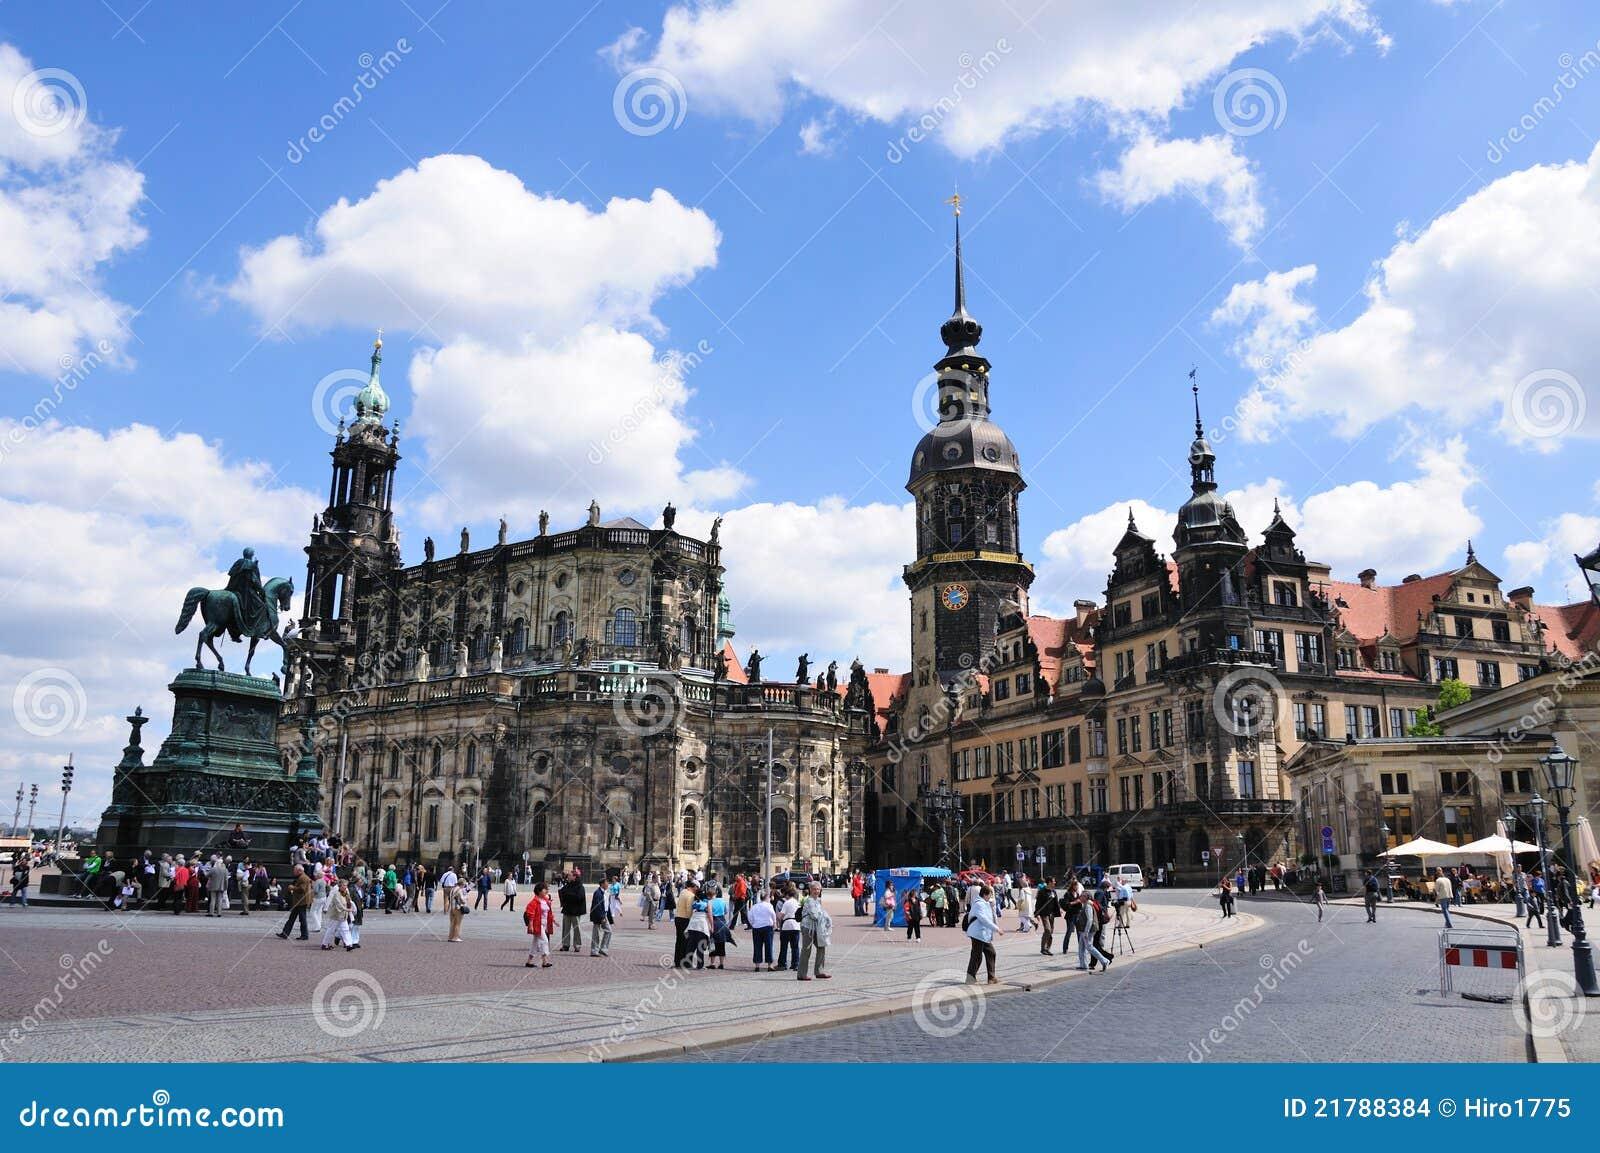 Seiten Dresden Dating